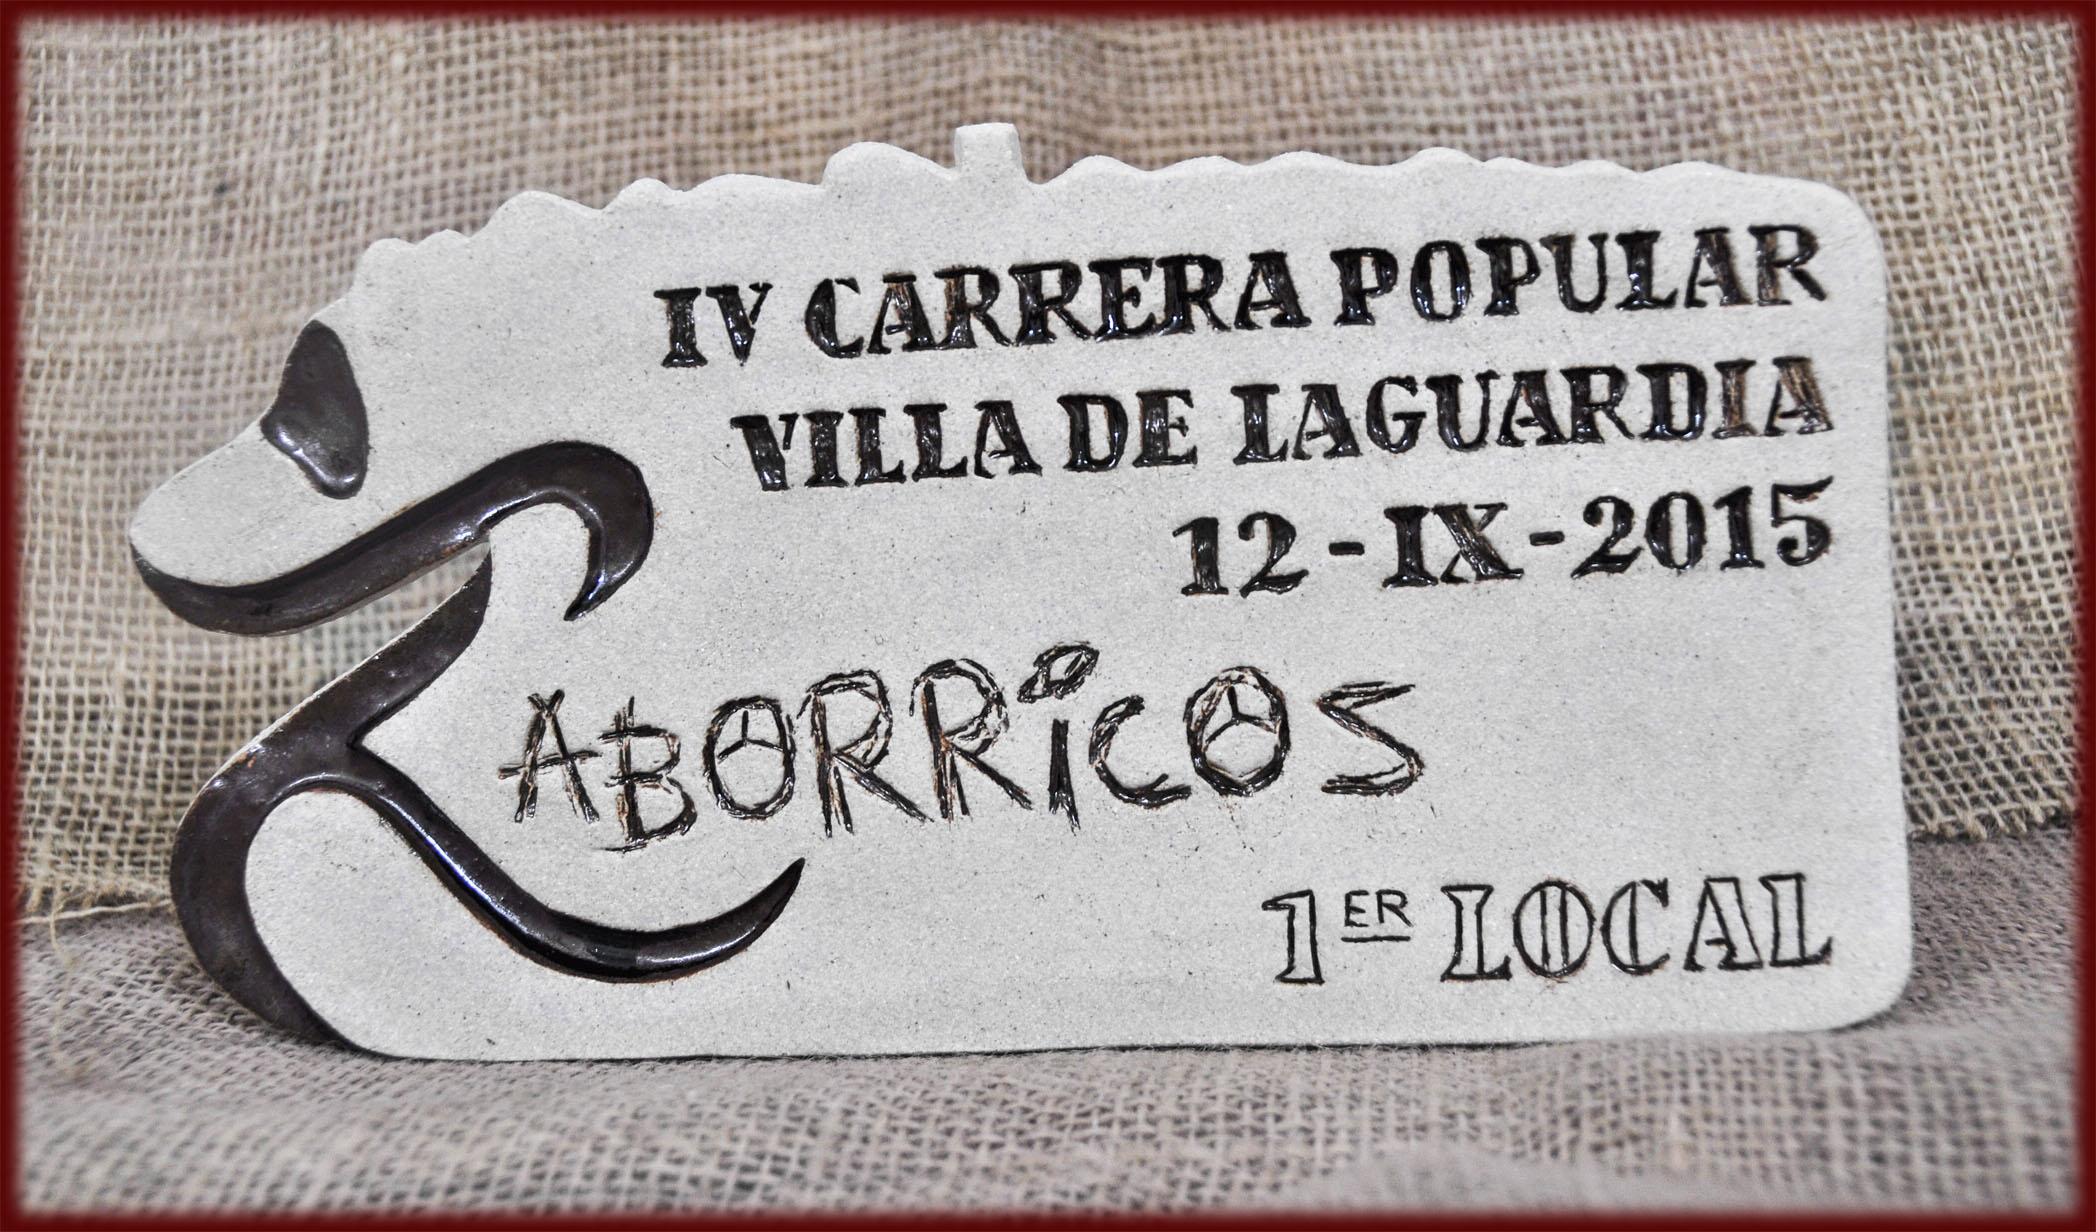 Trofeo Zaborricos 1º Local